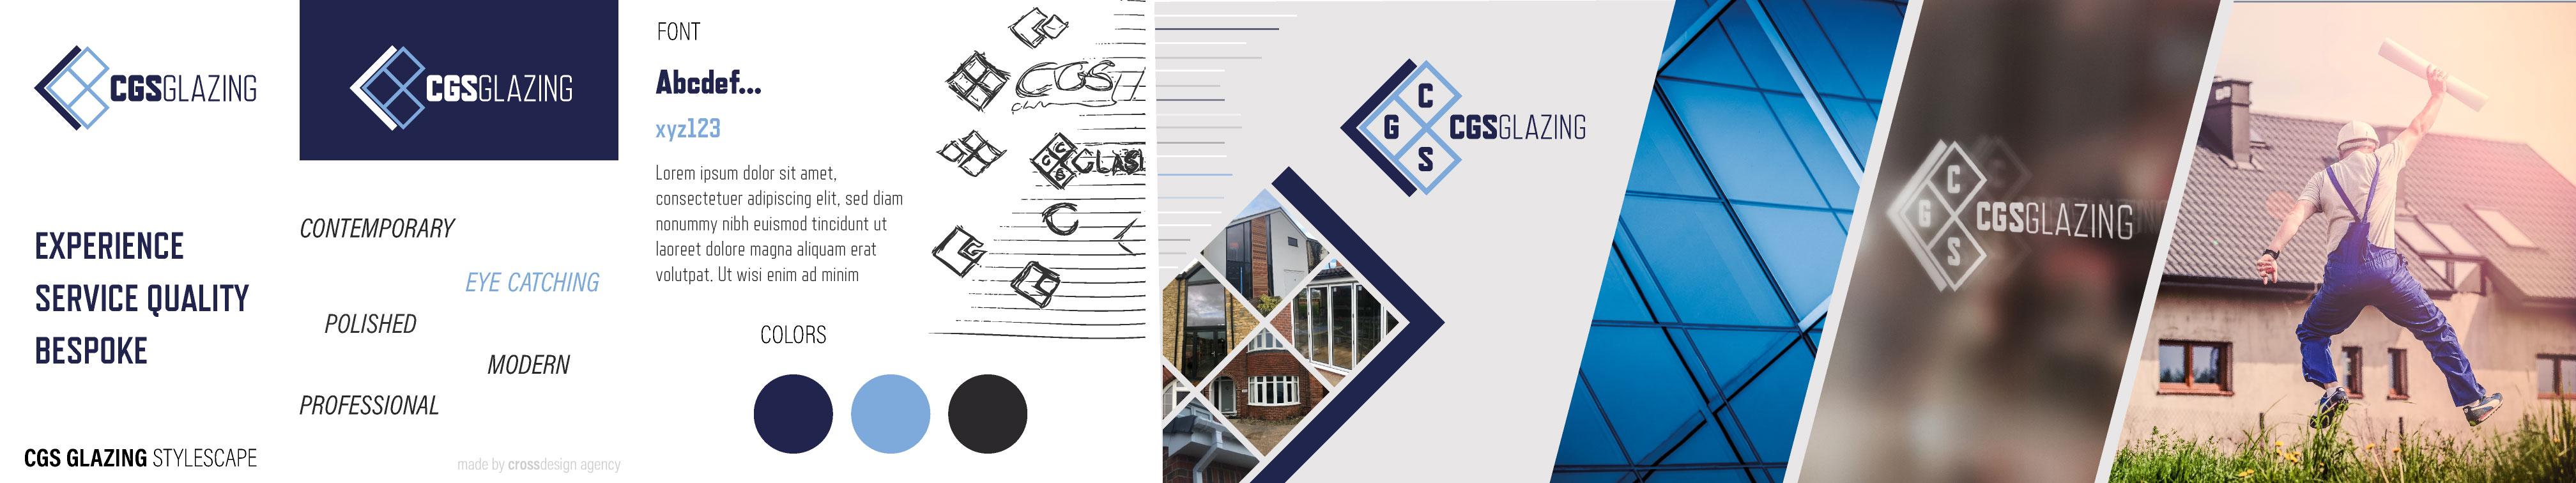 Stylescape Graphic Design: CGS Glazing Yorkshire